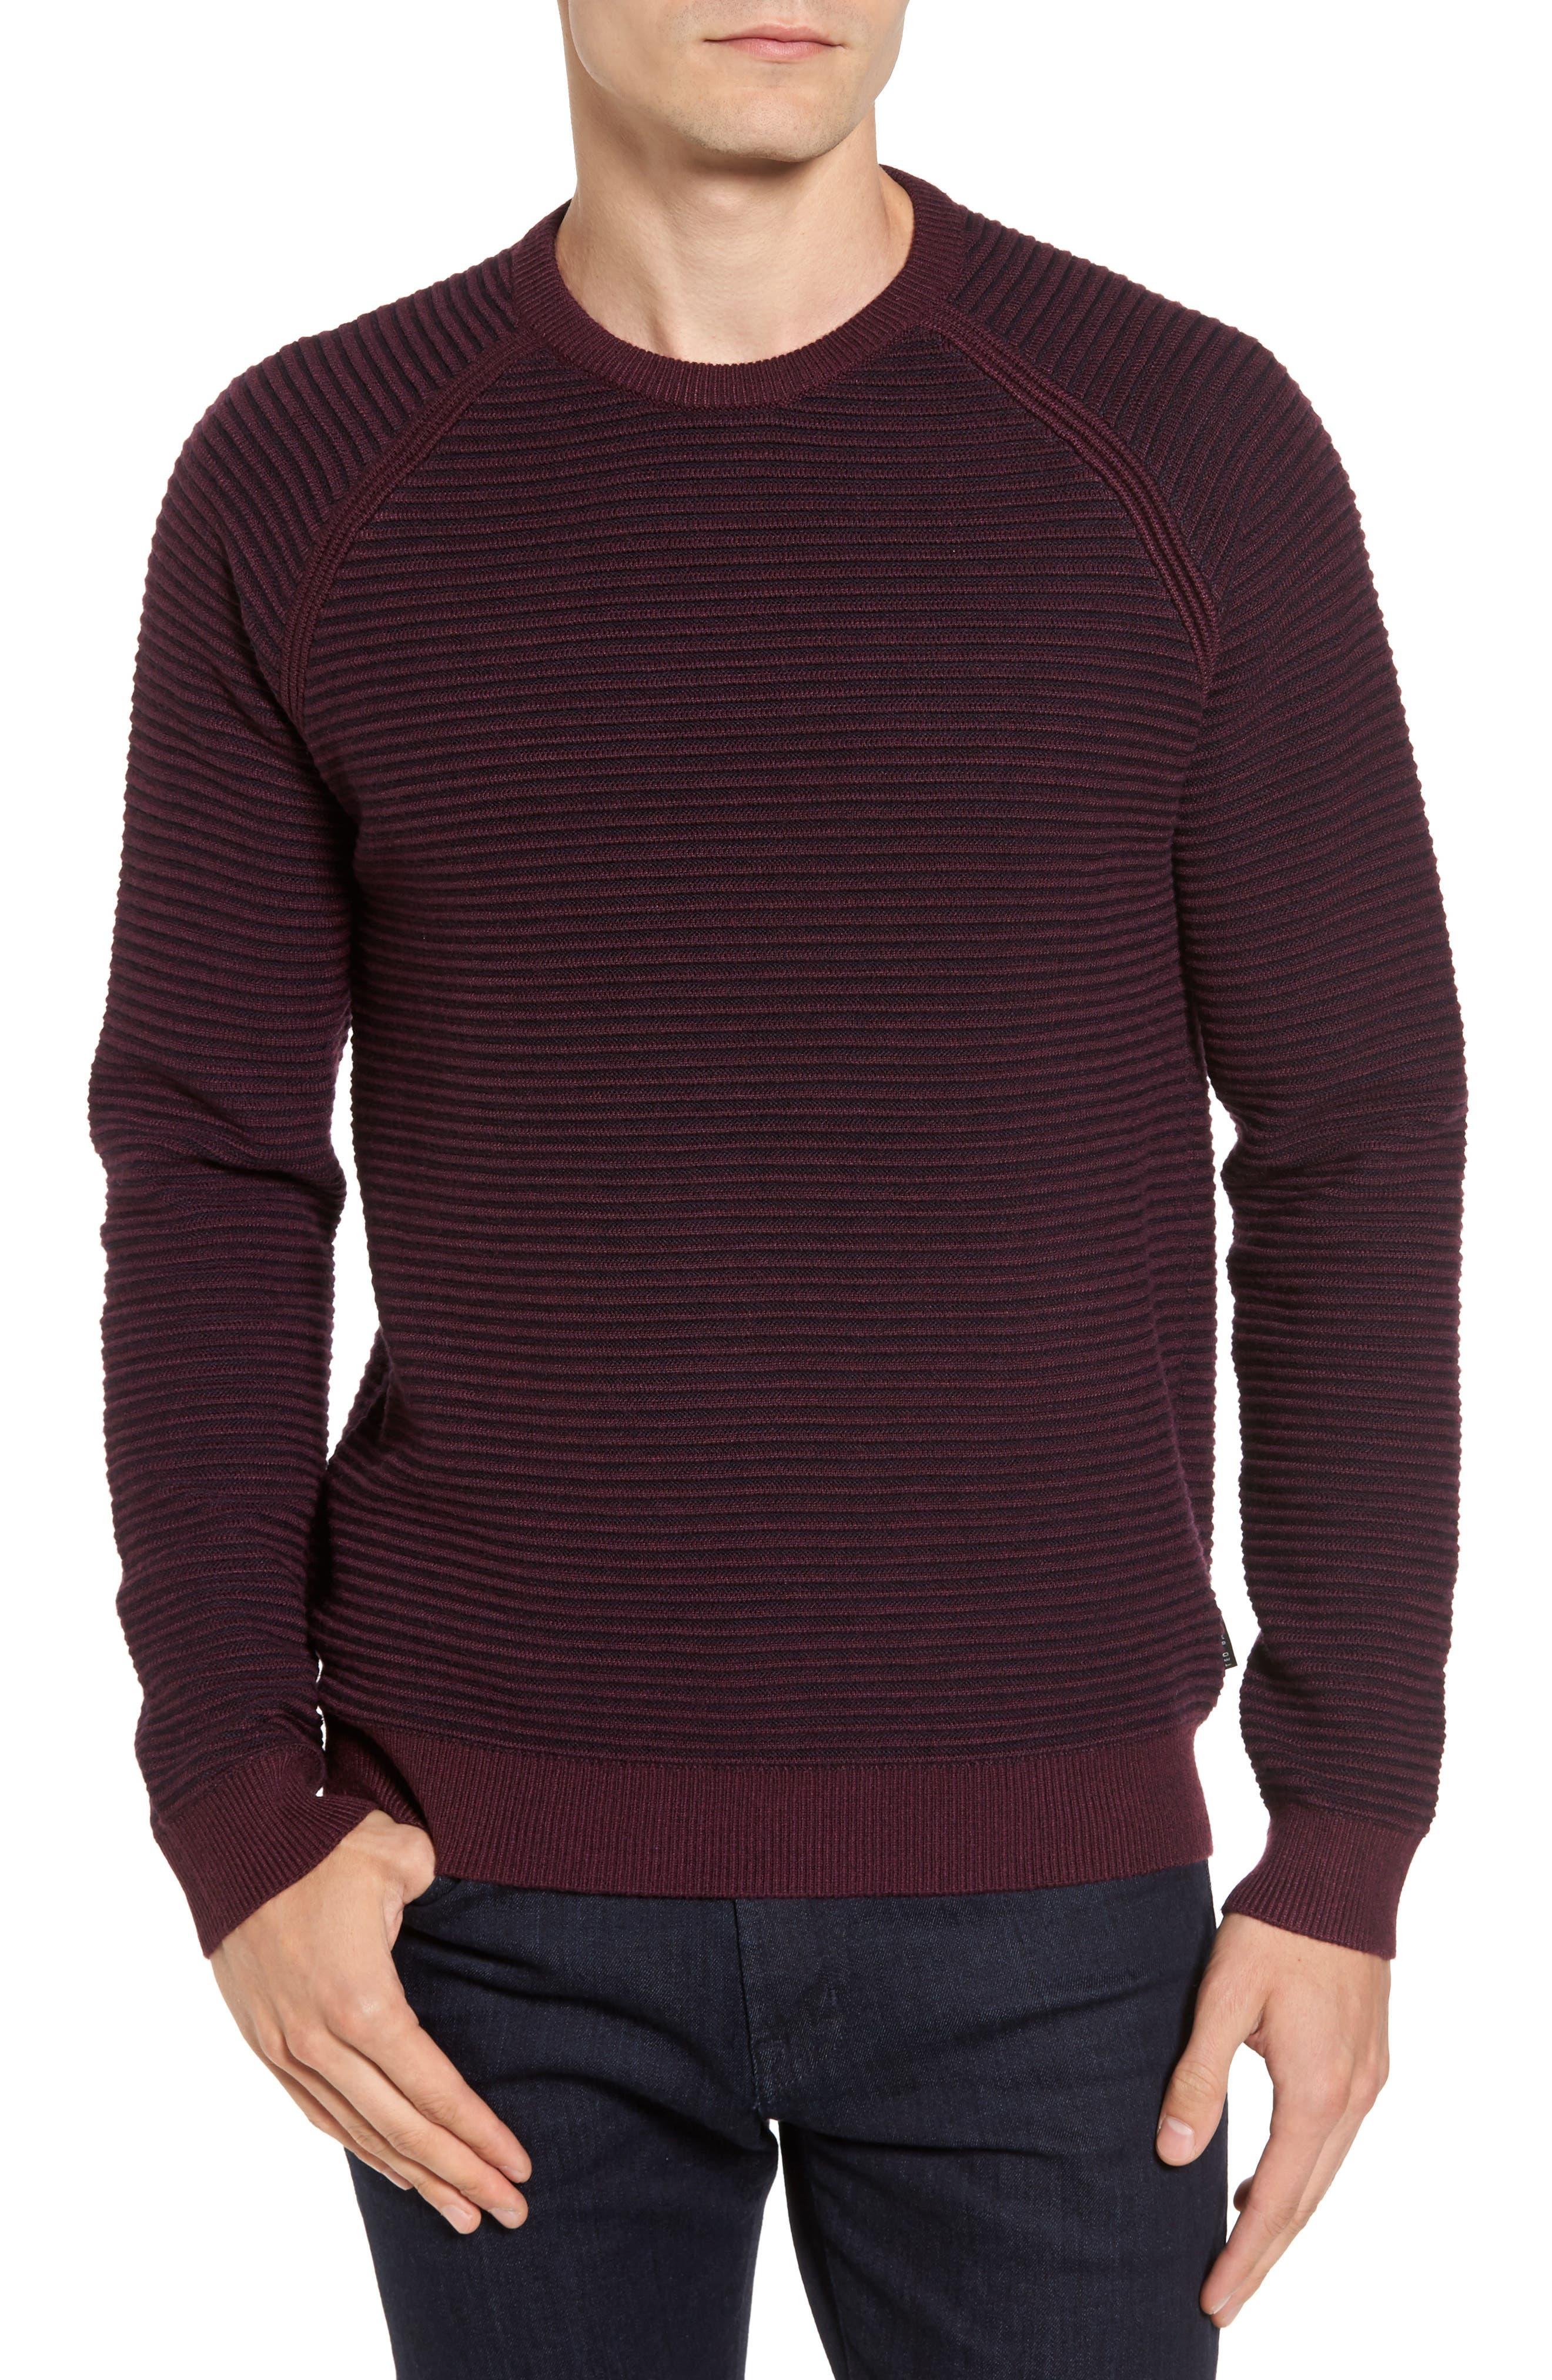 Cashoo Slim Fit Ribbed Sweatshirt,                         Main,                         color, Purple